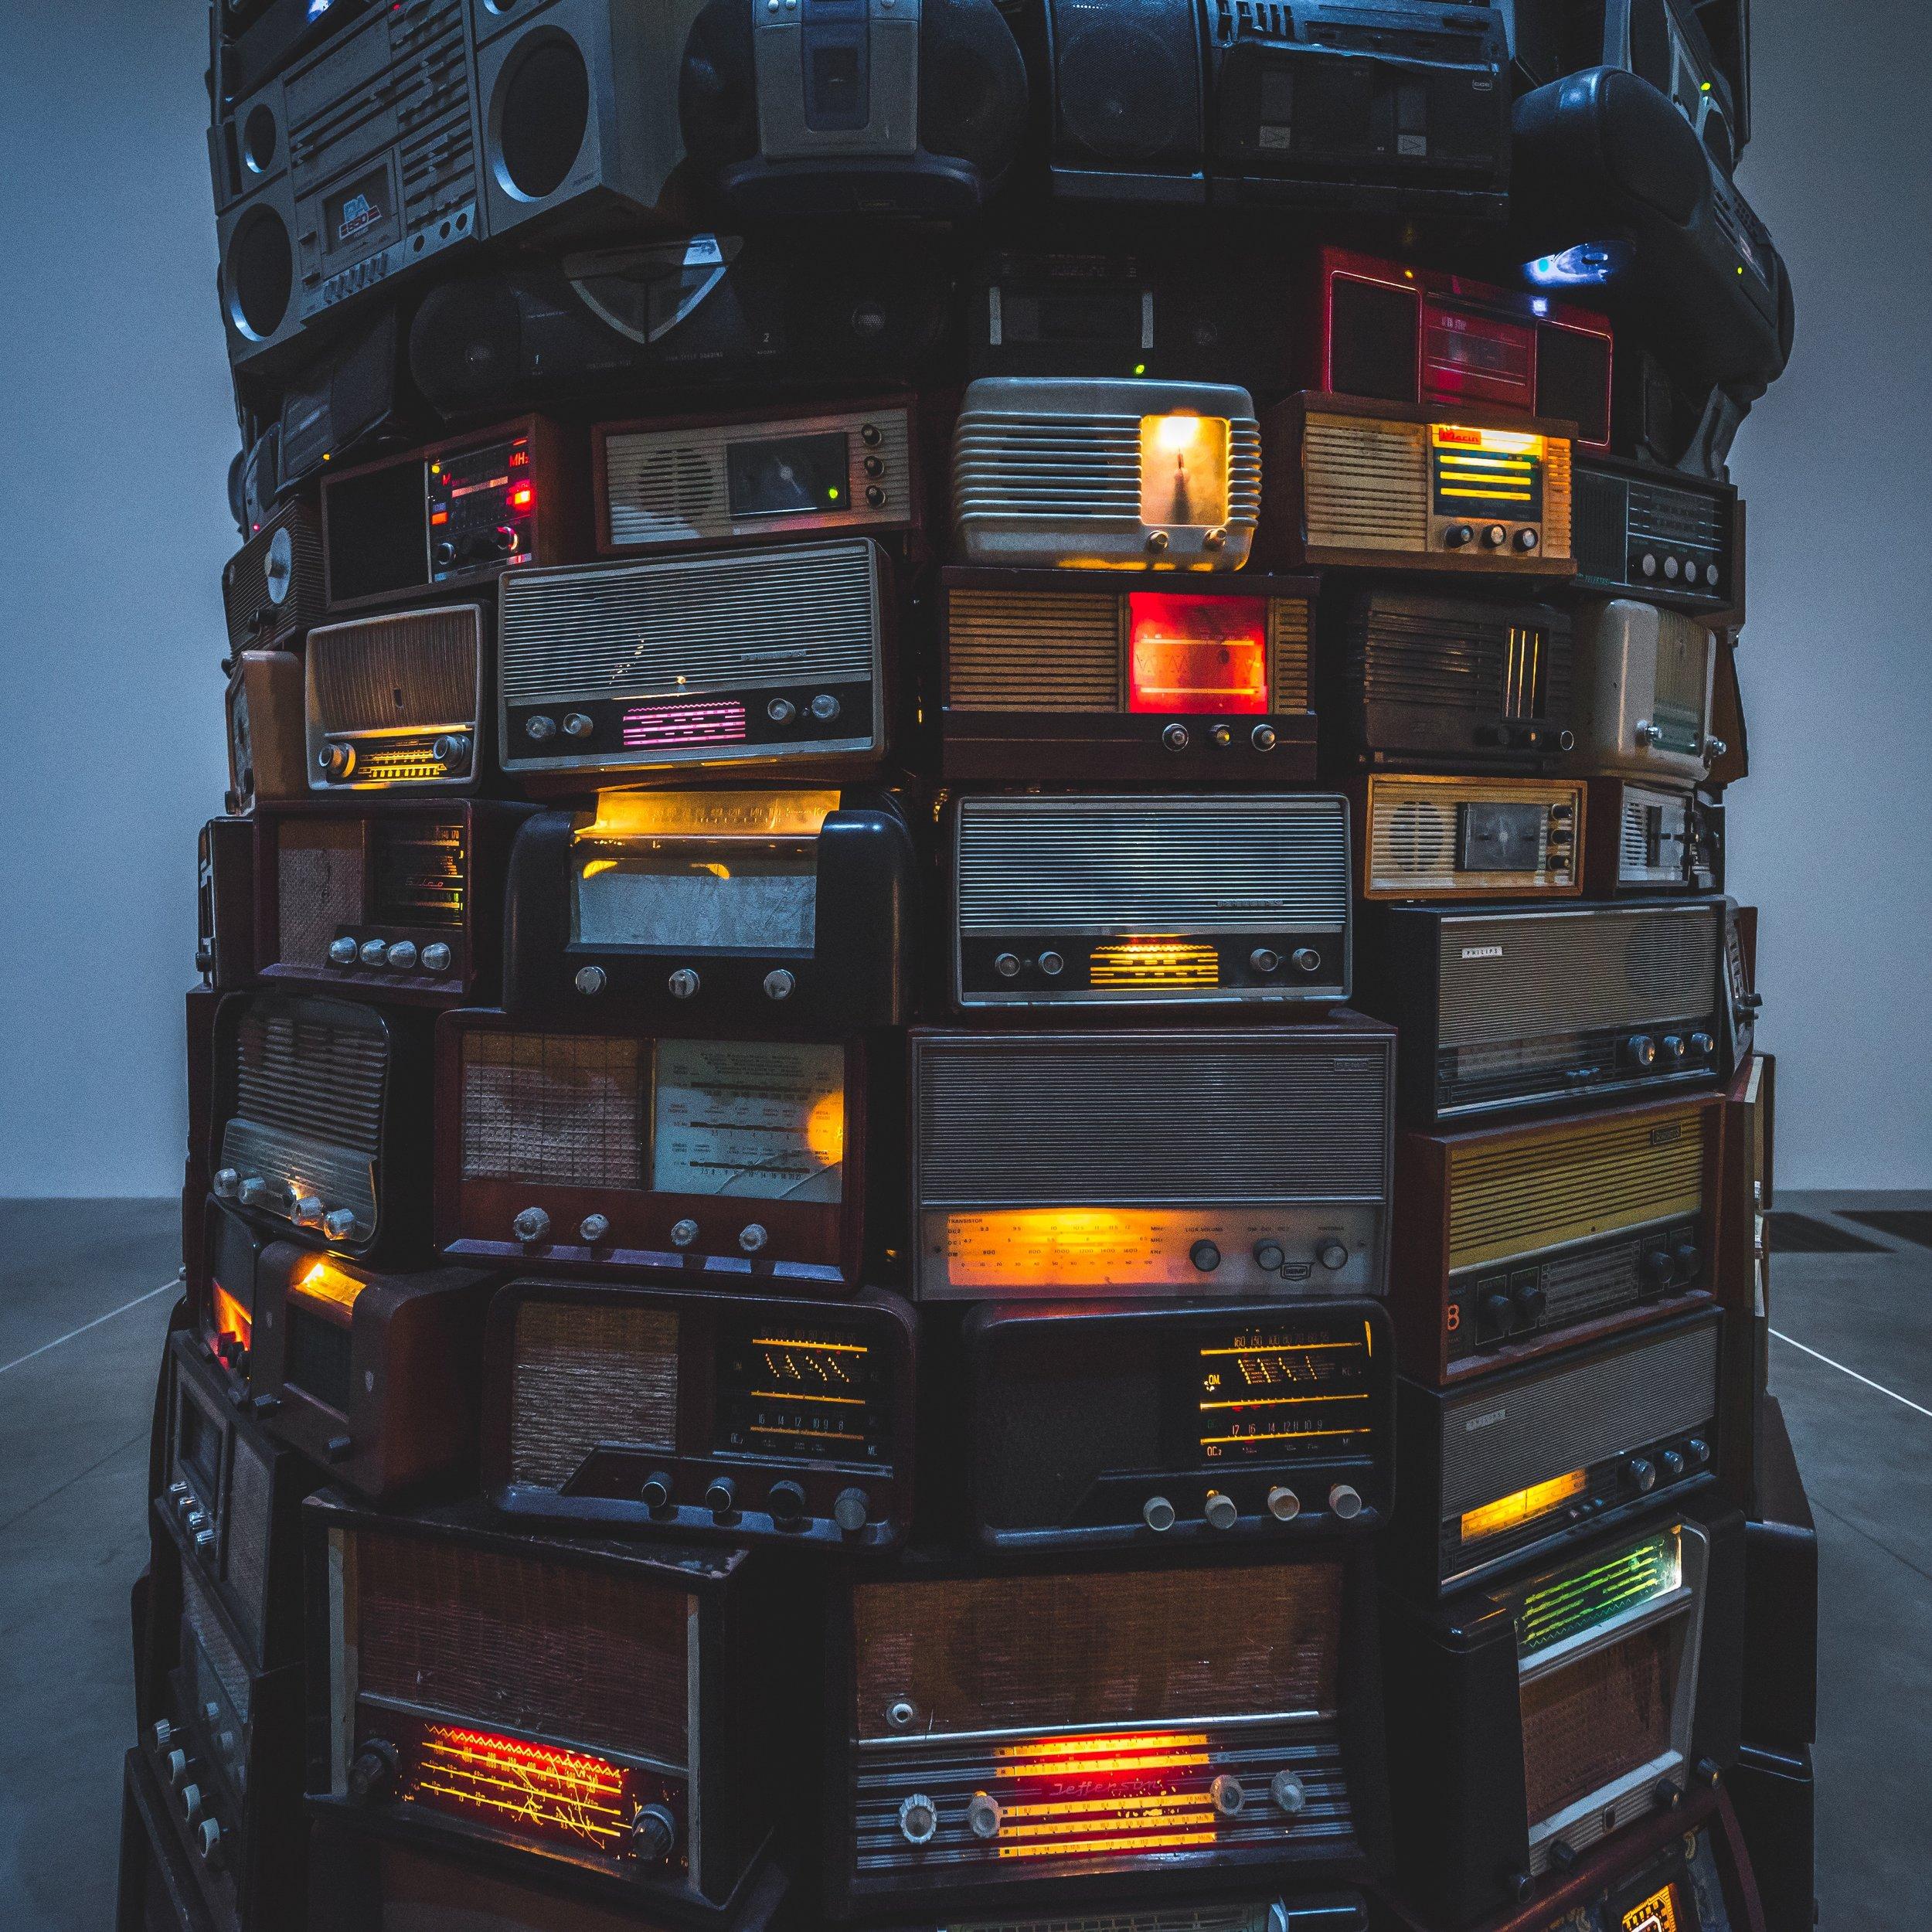 Radio Cinema ryan-stefan-473230-unsplash.jpg